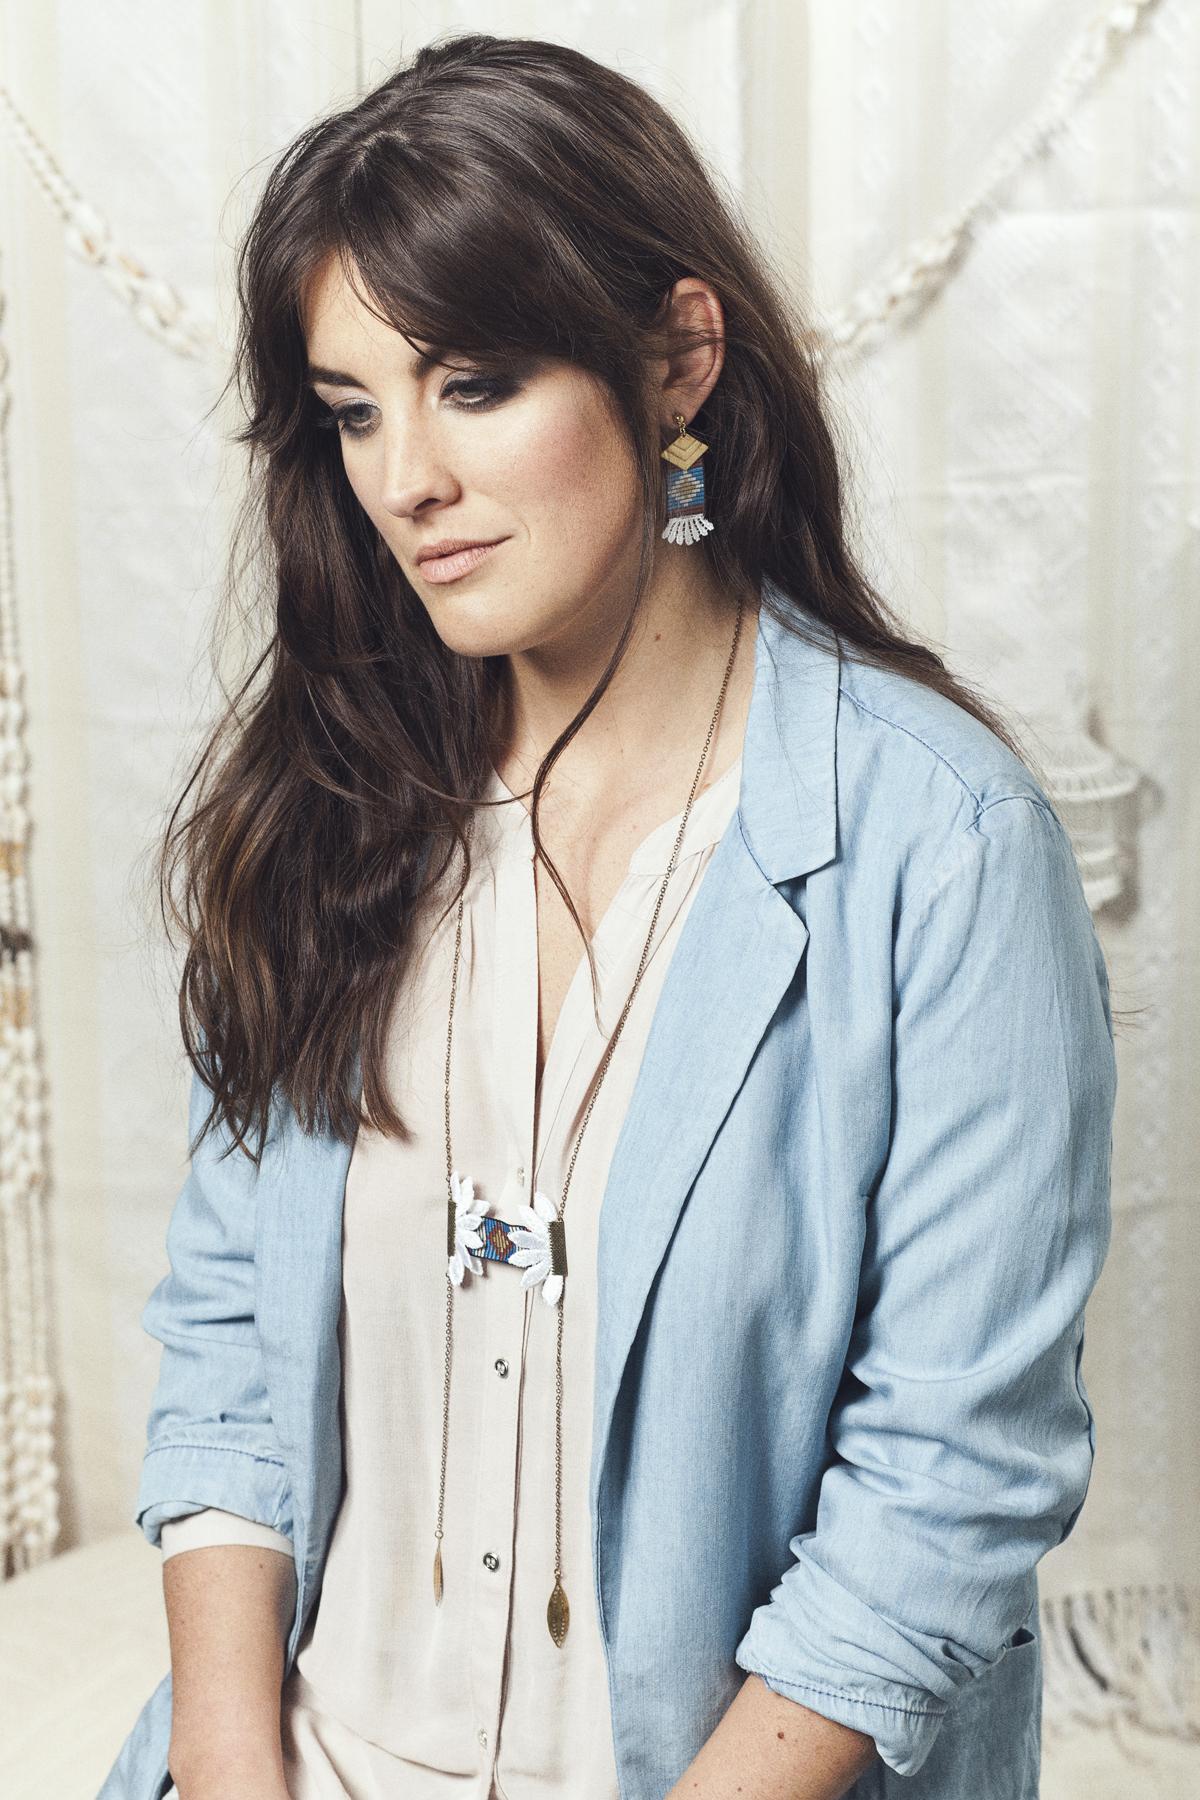 Oaxaca earrings (details here) +  Pendulum necklace (details here)